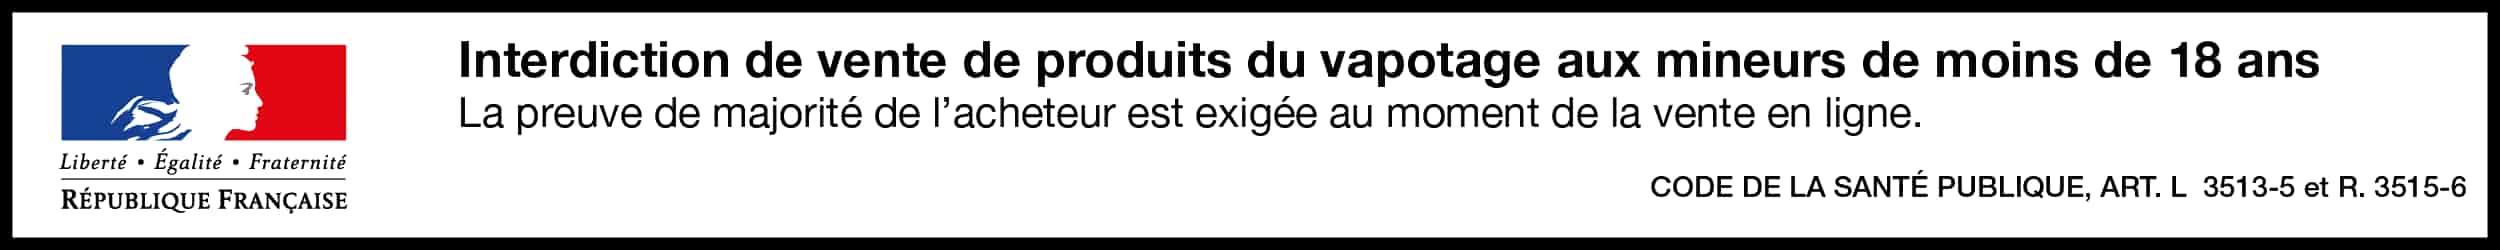 France-legislation-vapotage